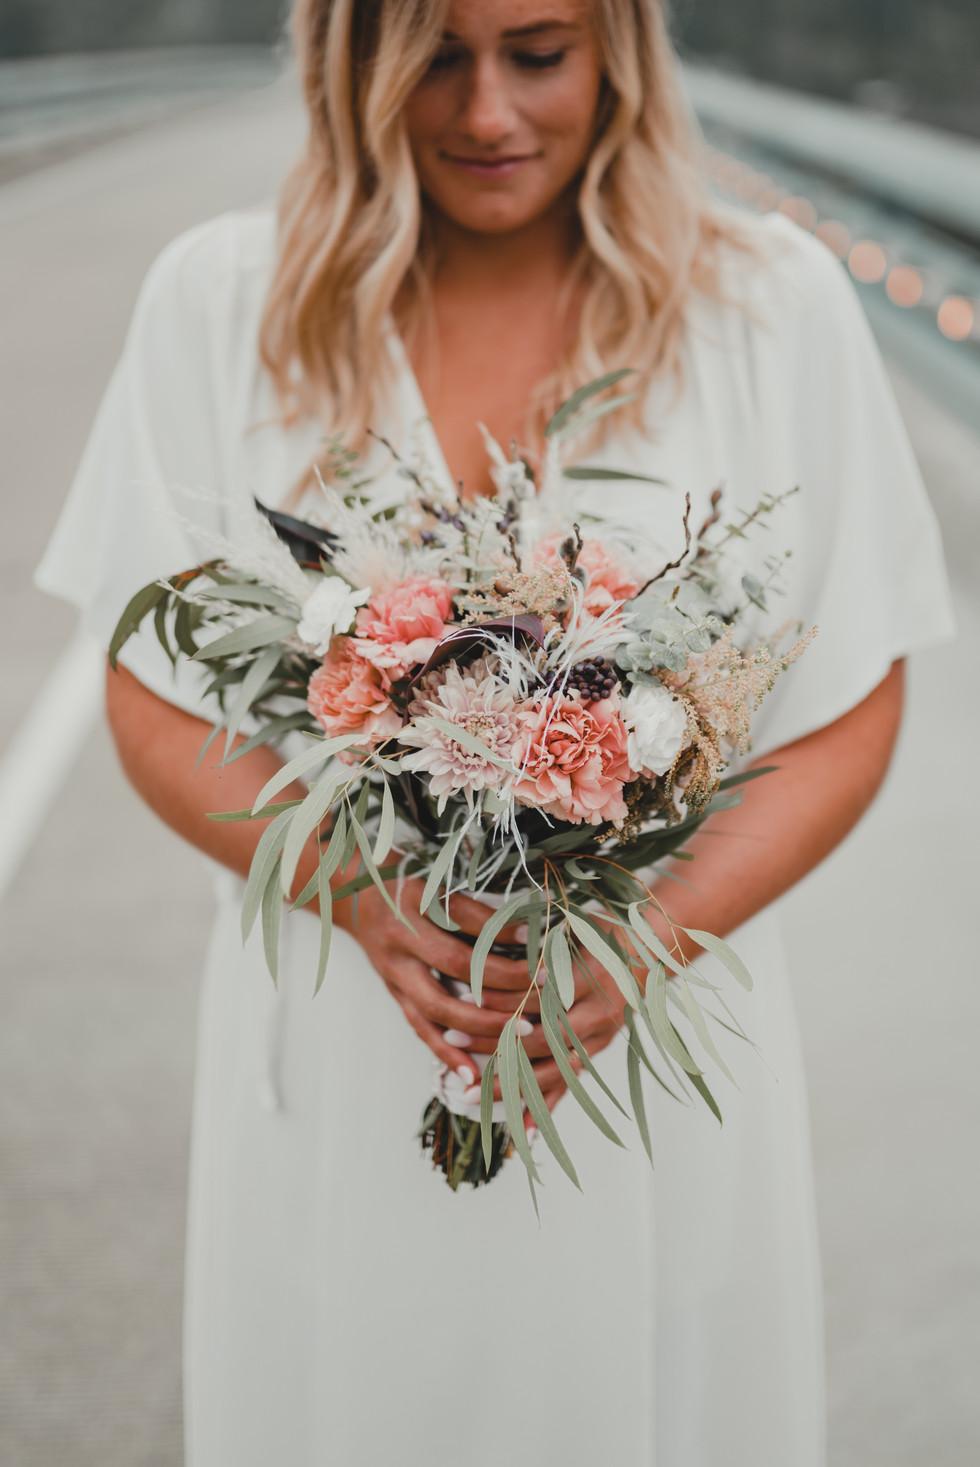 Seattle, Wedding, Elopement, Bride, Dress, Bouquet, PNW, Photographer